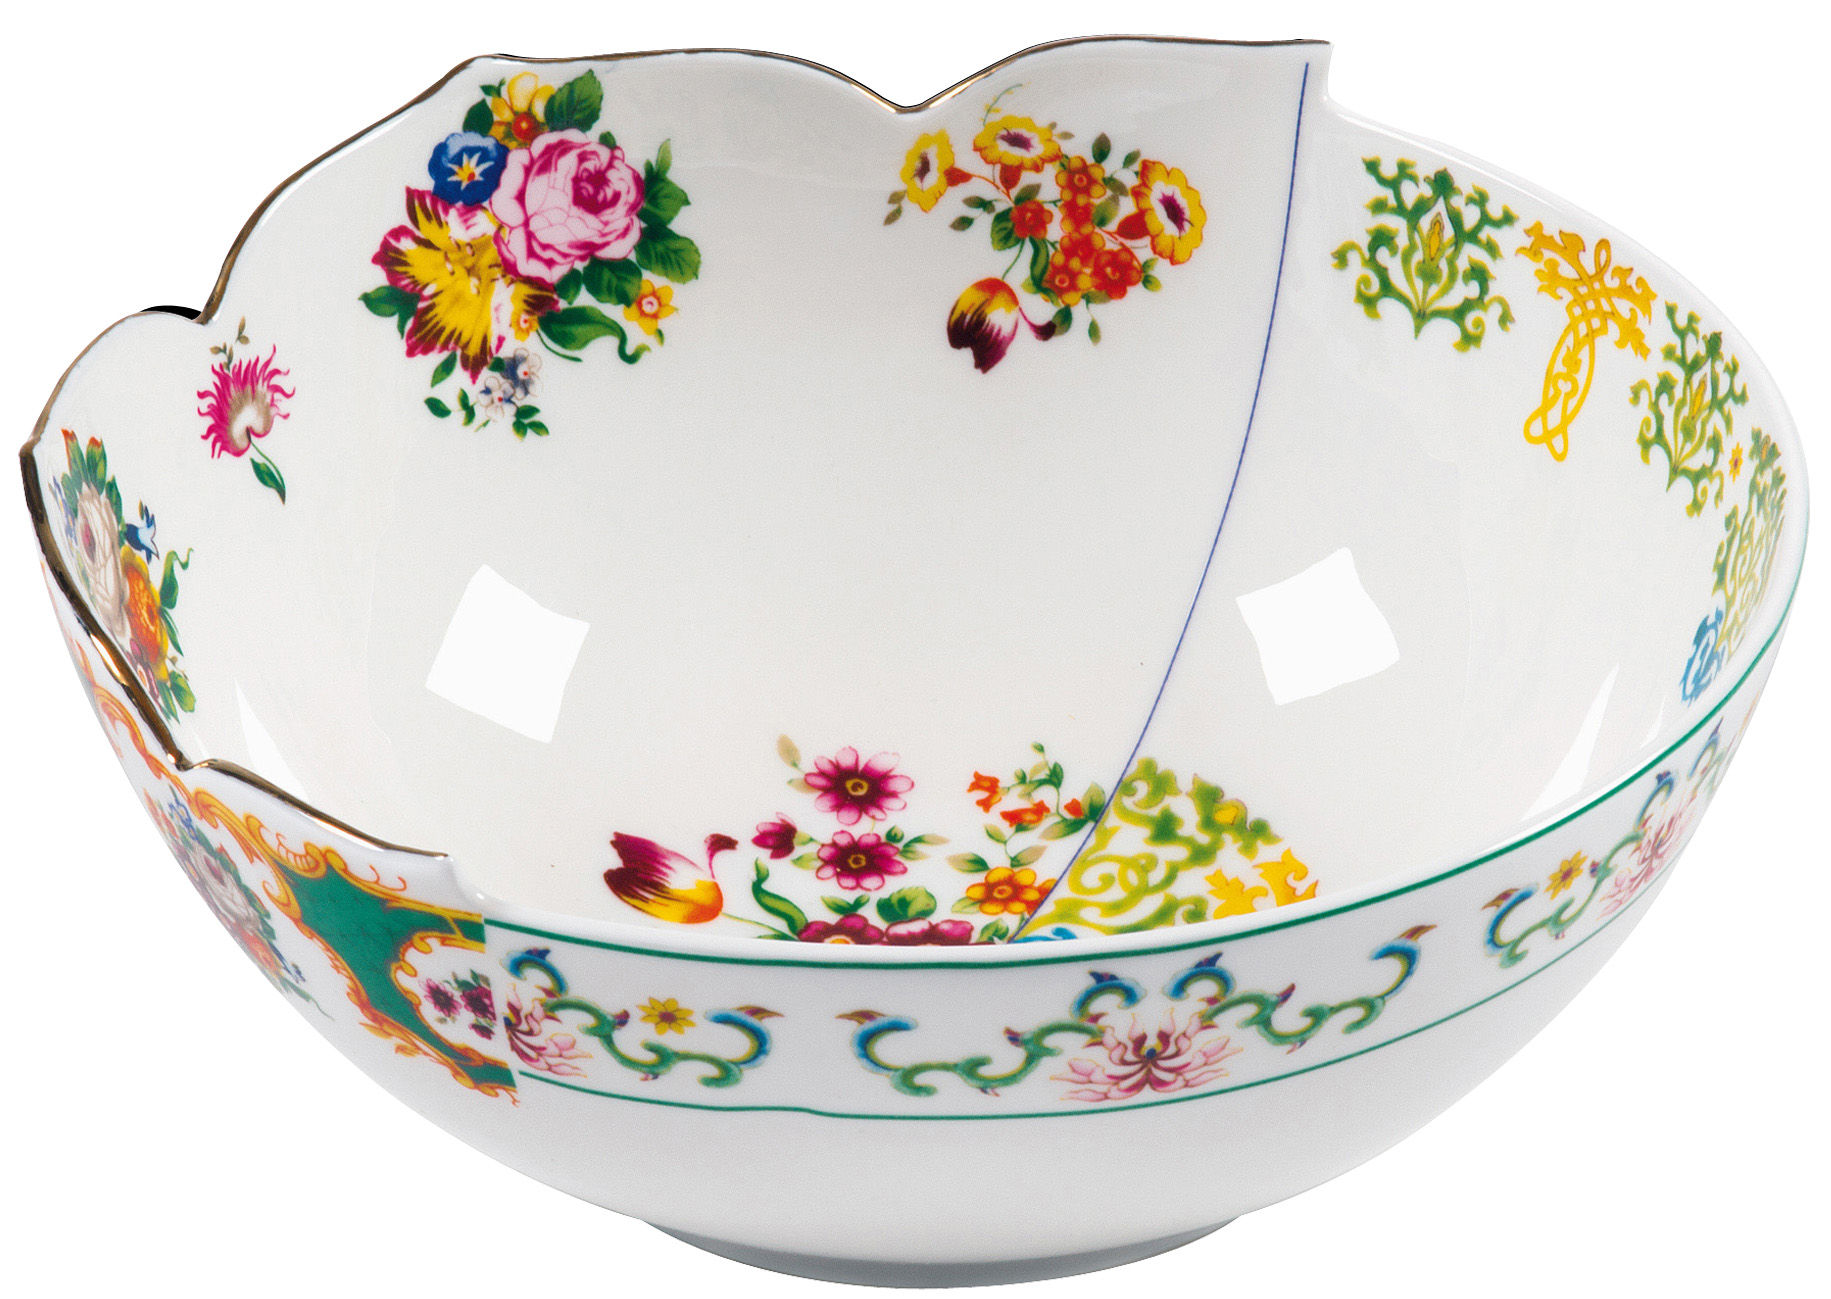 Tableware - Bowls - Hybrid - Zaira Salad bowl - Ø 22,5 cm by Seletti - Zaira - Ø 22,5 cm - China